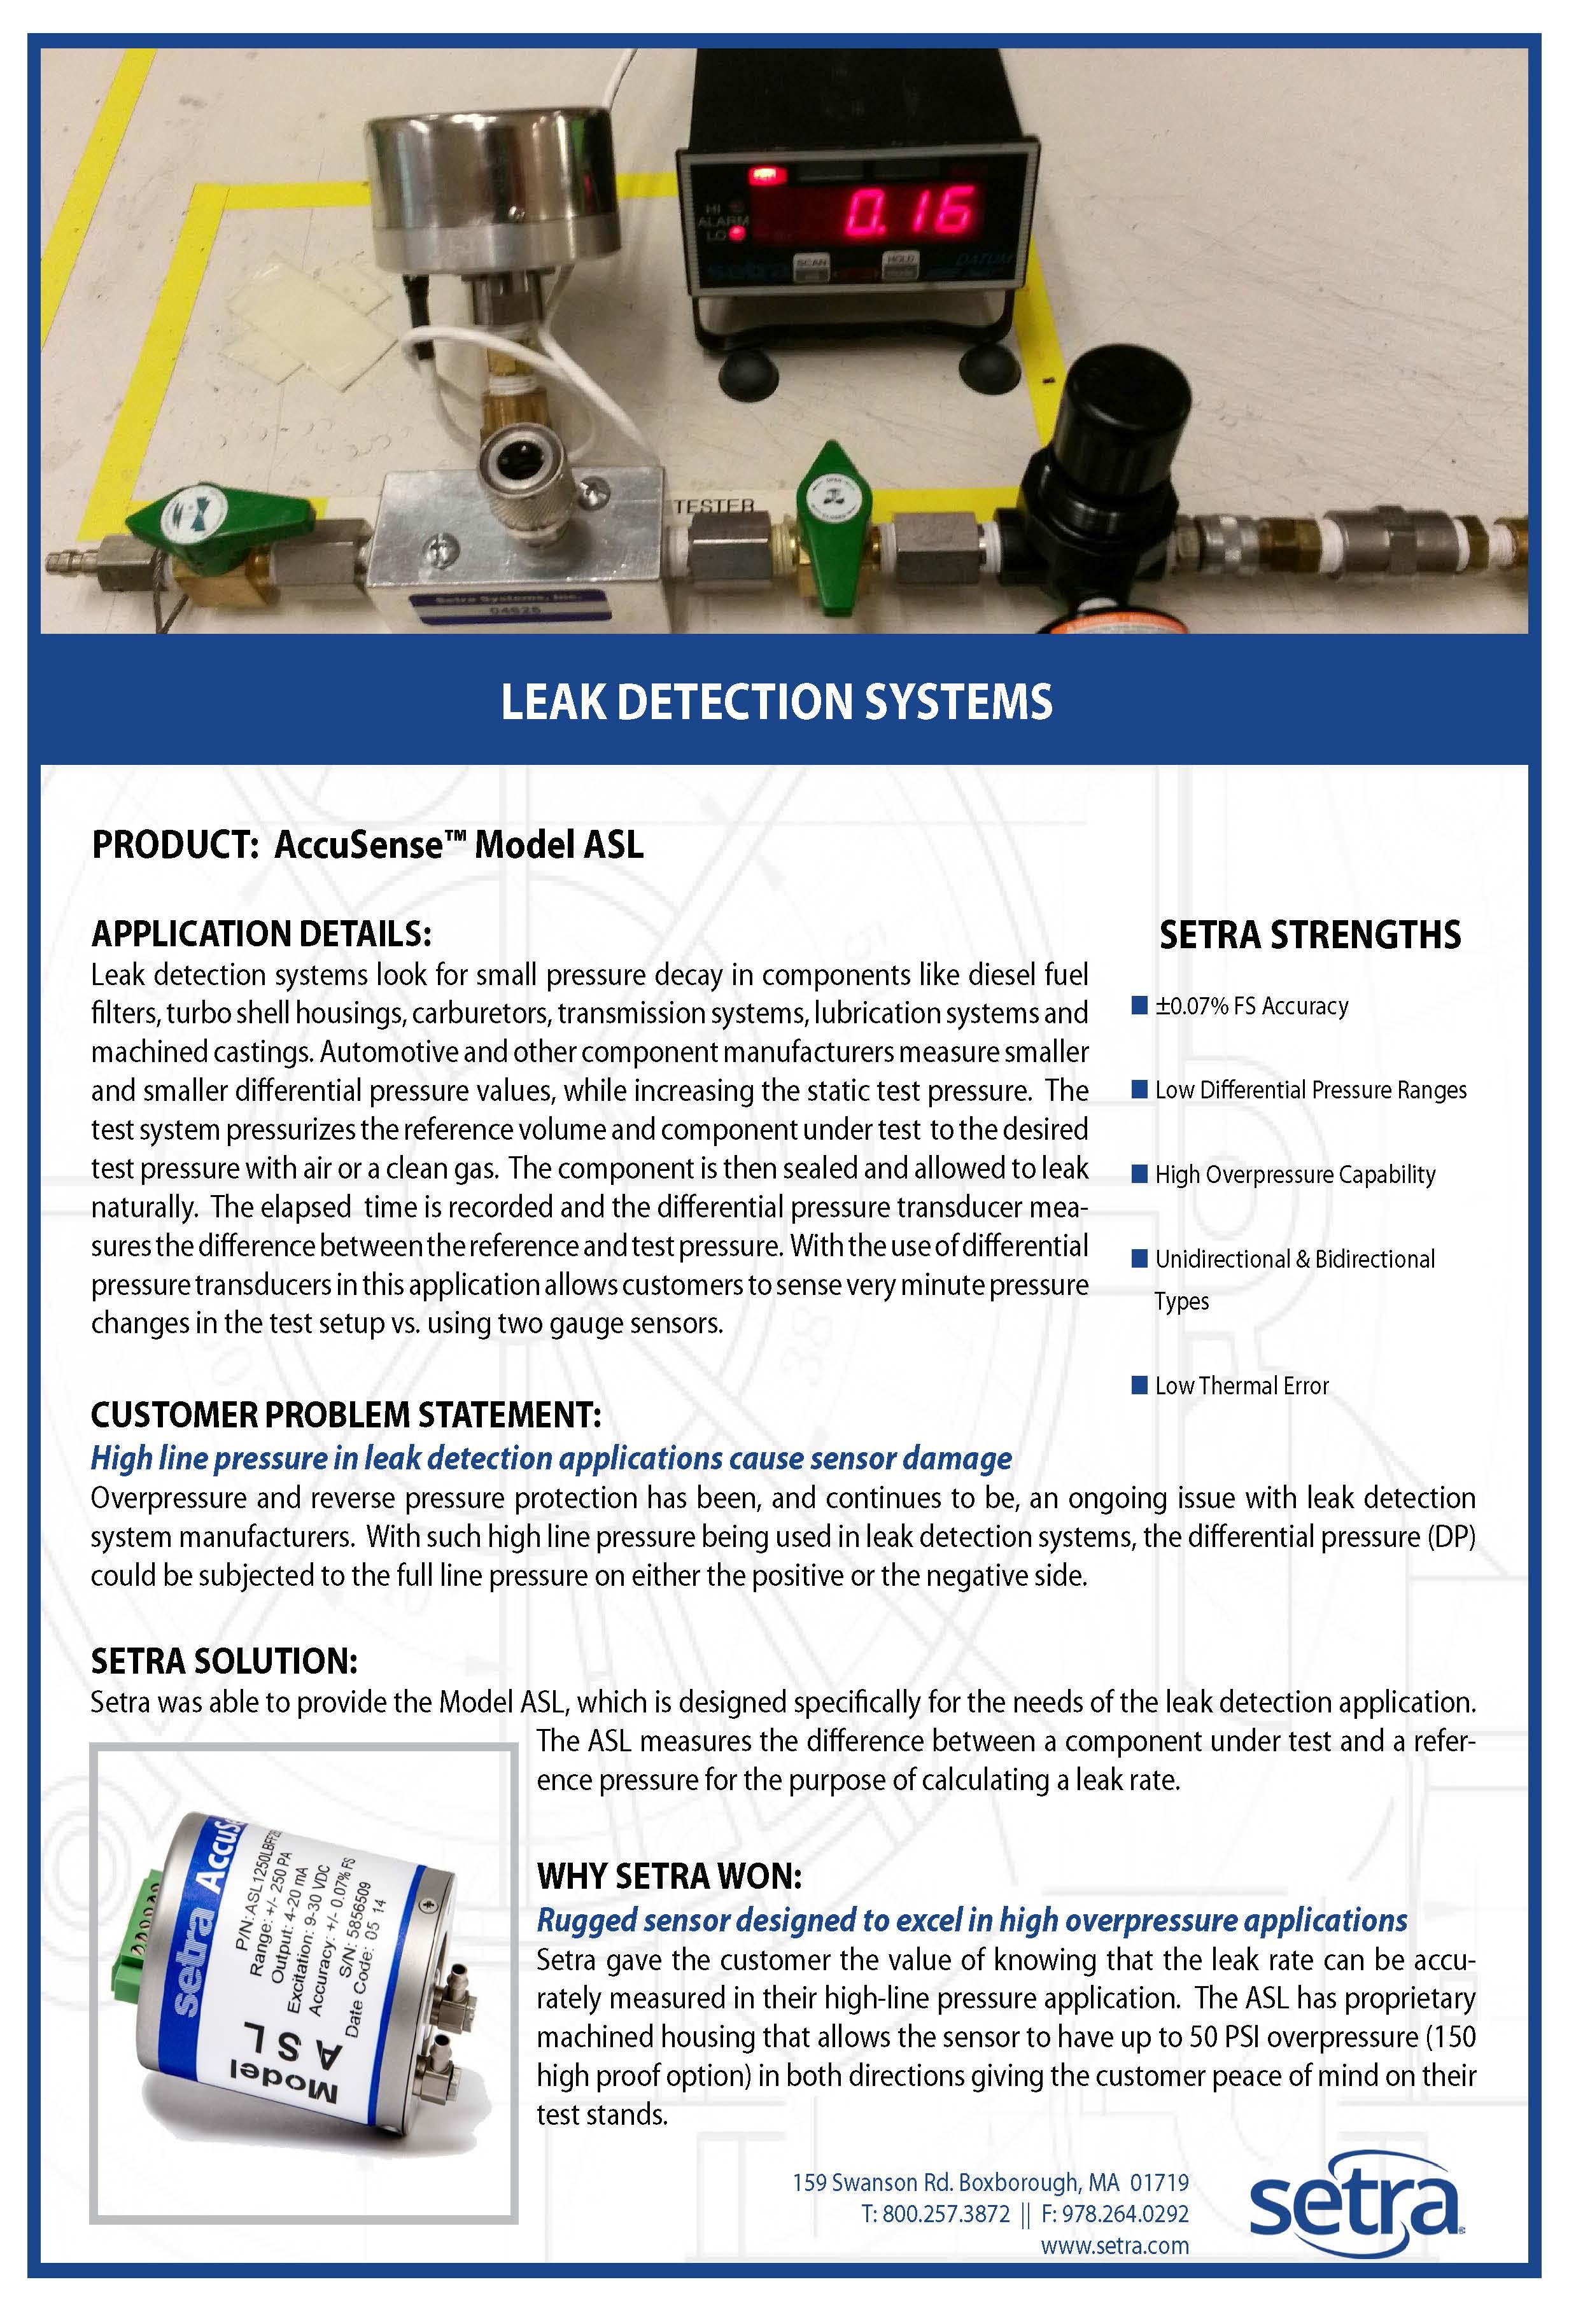 setra asl; leak detection; automotive; pressure measurement; pressure transducers; pressure sensing